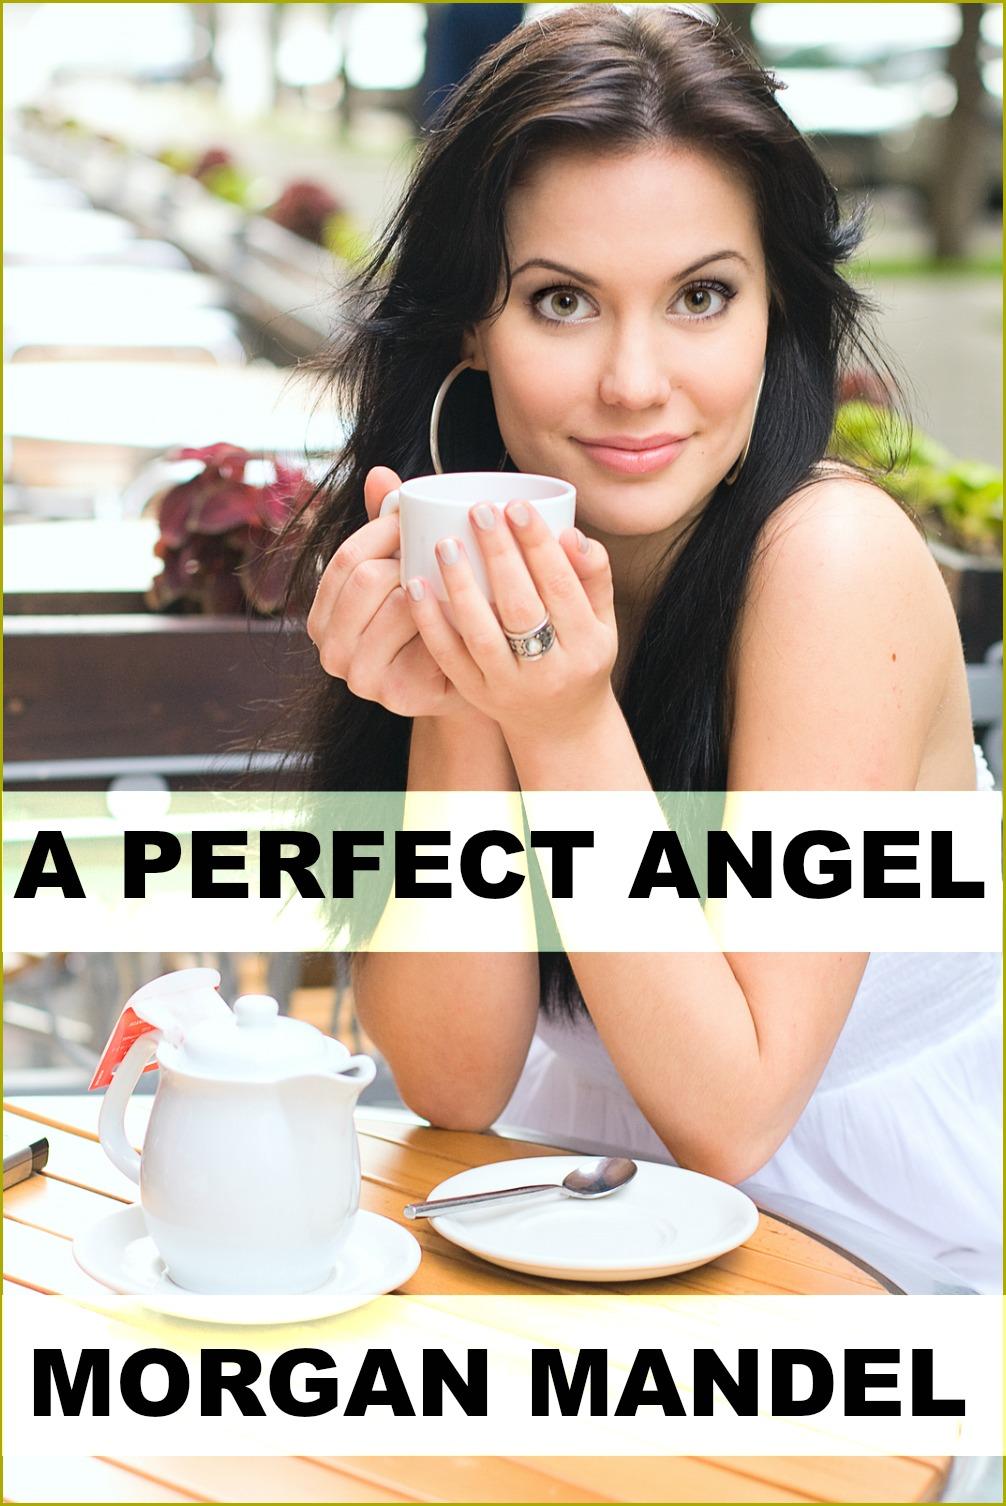 bigstock-PERFECT ANGEL5edgesoftsmaller